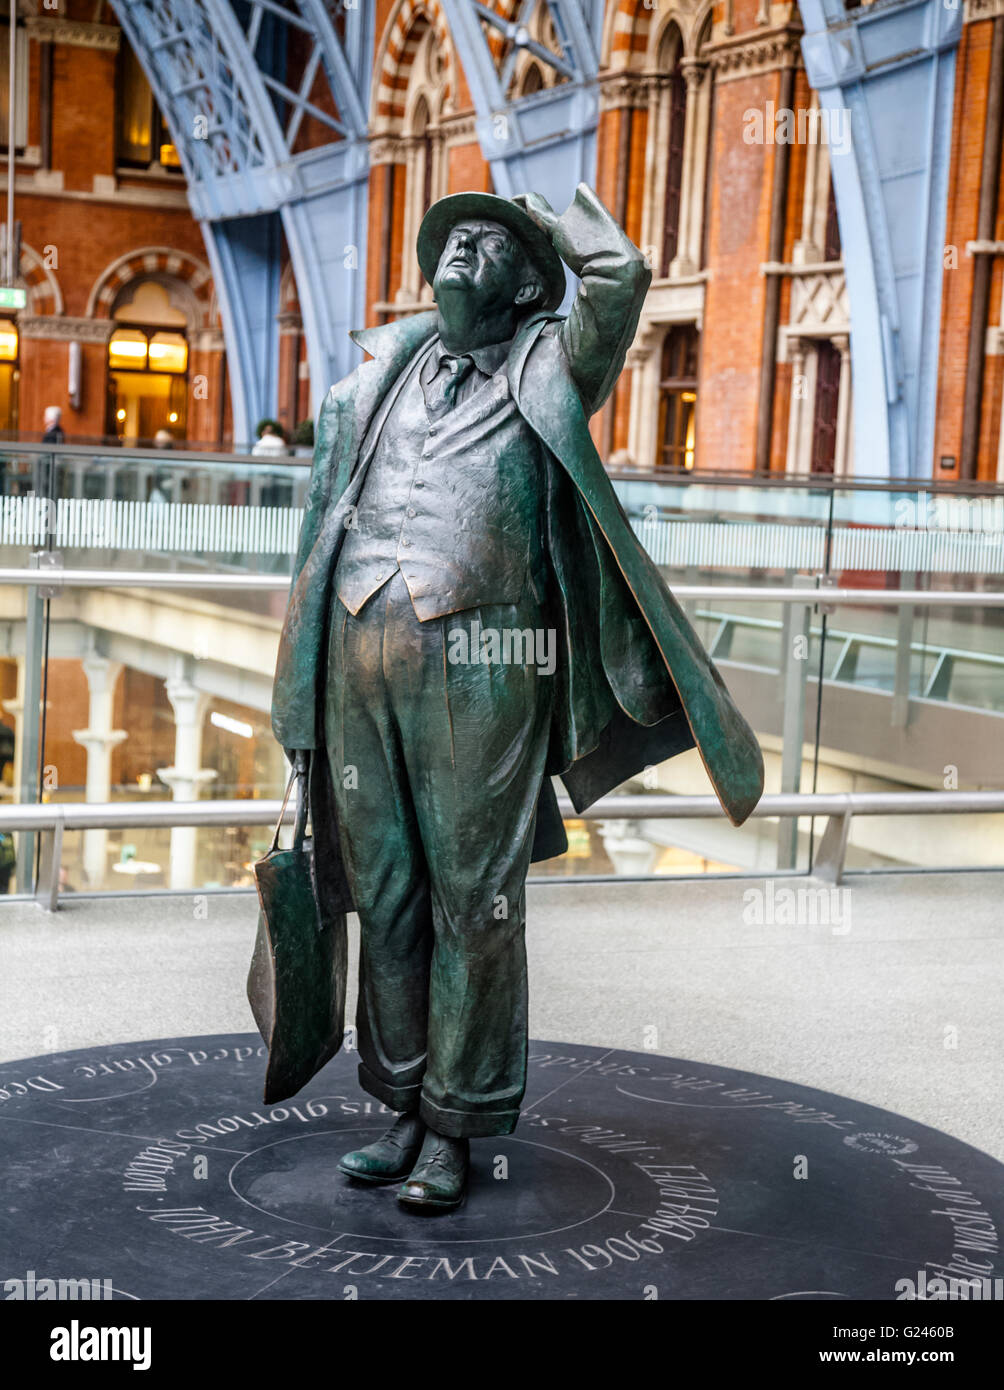 John Betjeman's Statue by Martin Jennings, St Pancras Railway Station, London, England. - Stock Image